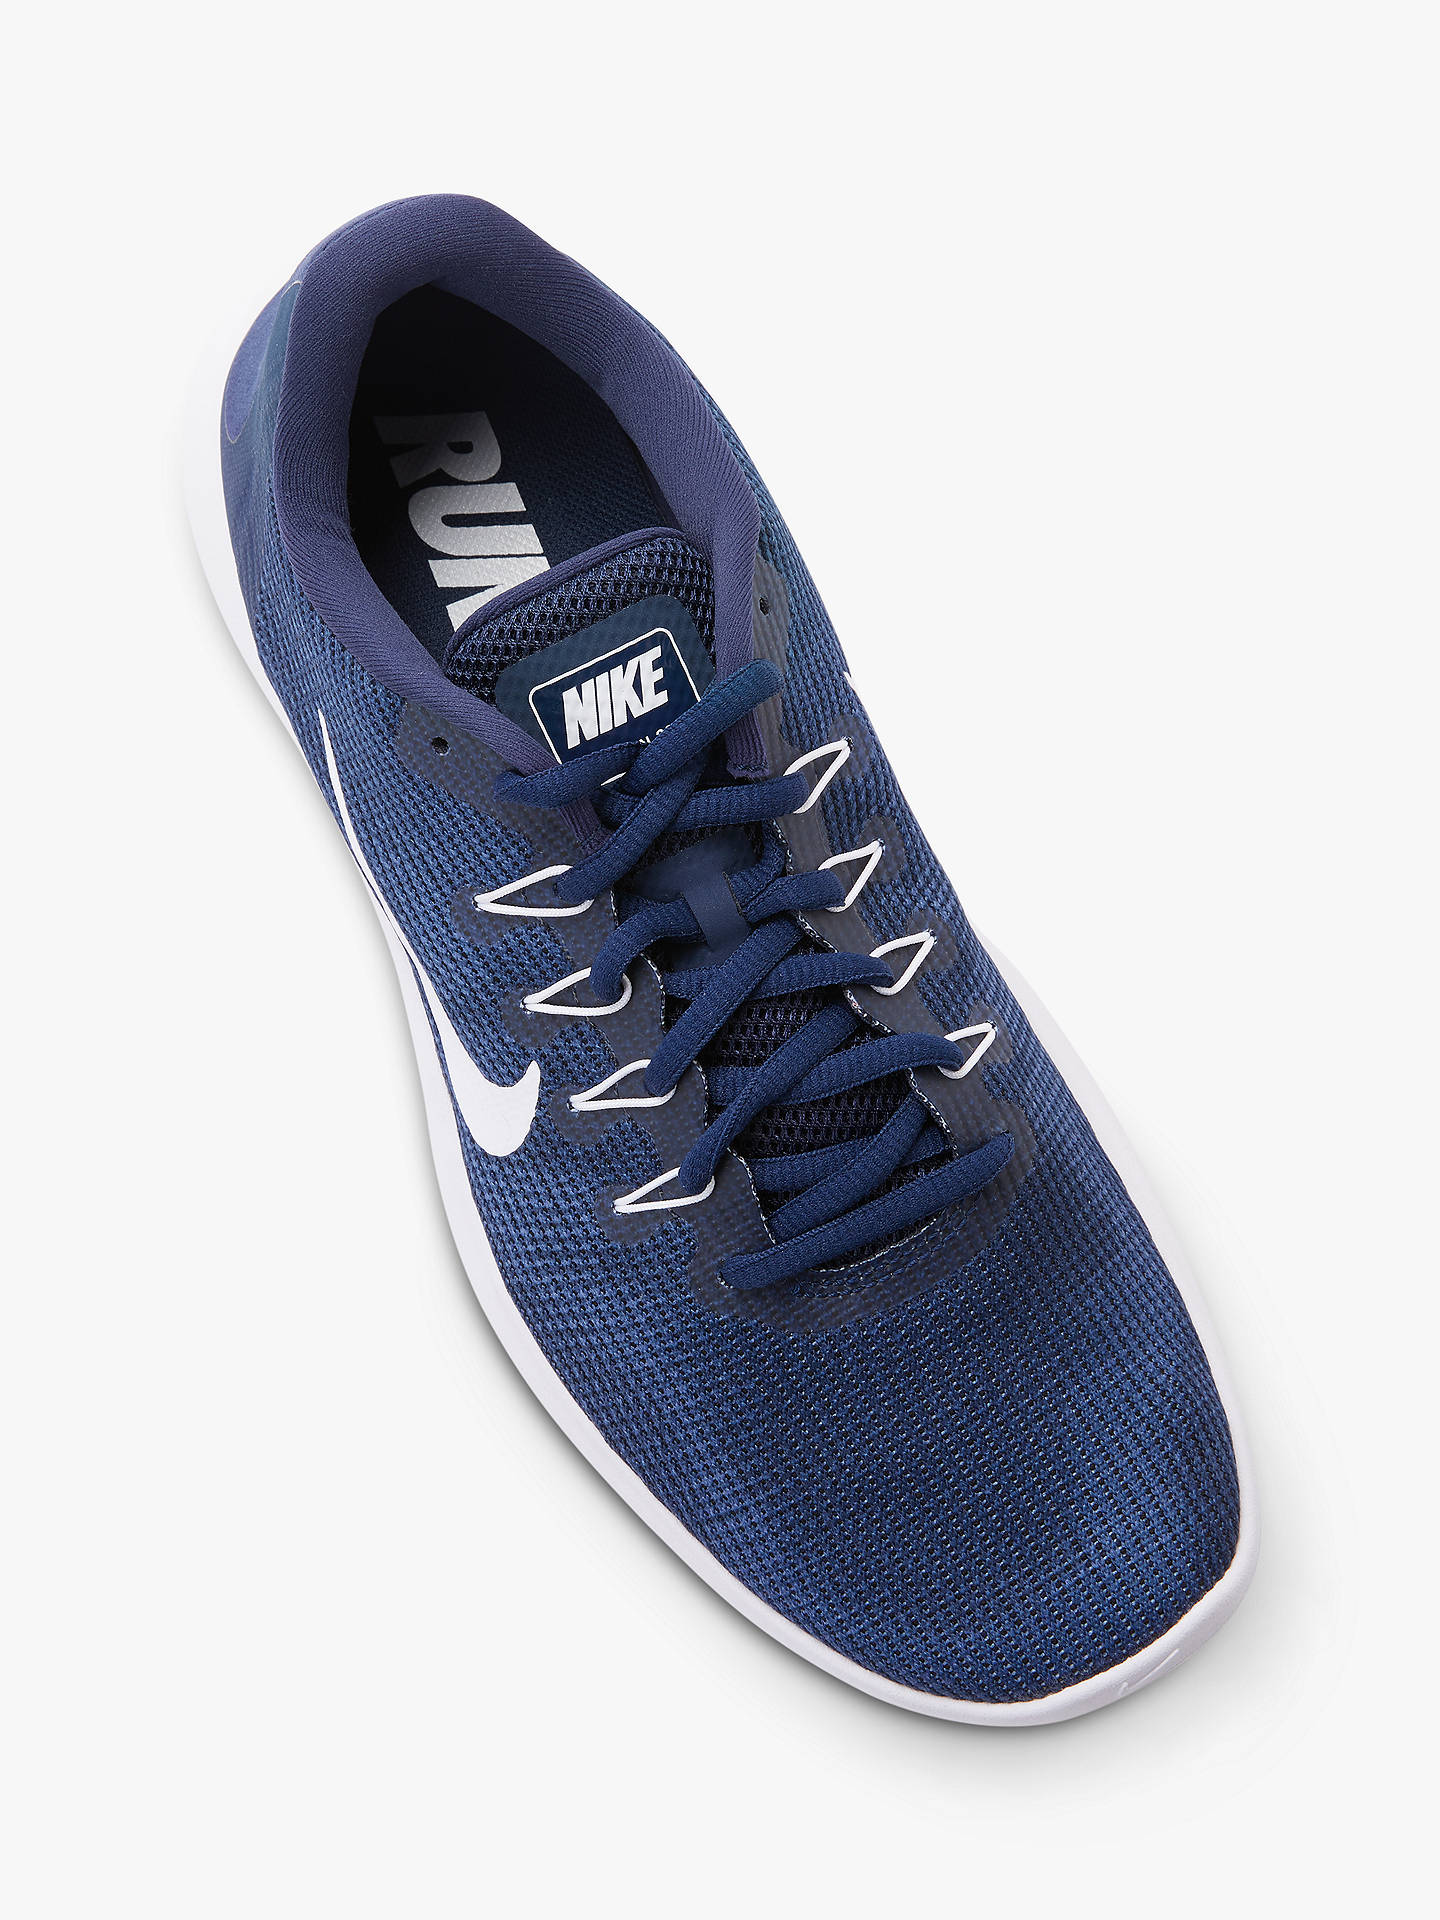 the latest ab240 5d8ba Nike Flex RN 2018 Men's Running Shoes, Midnight Blue/White ...